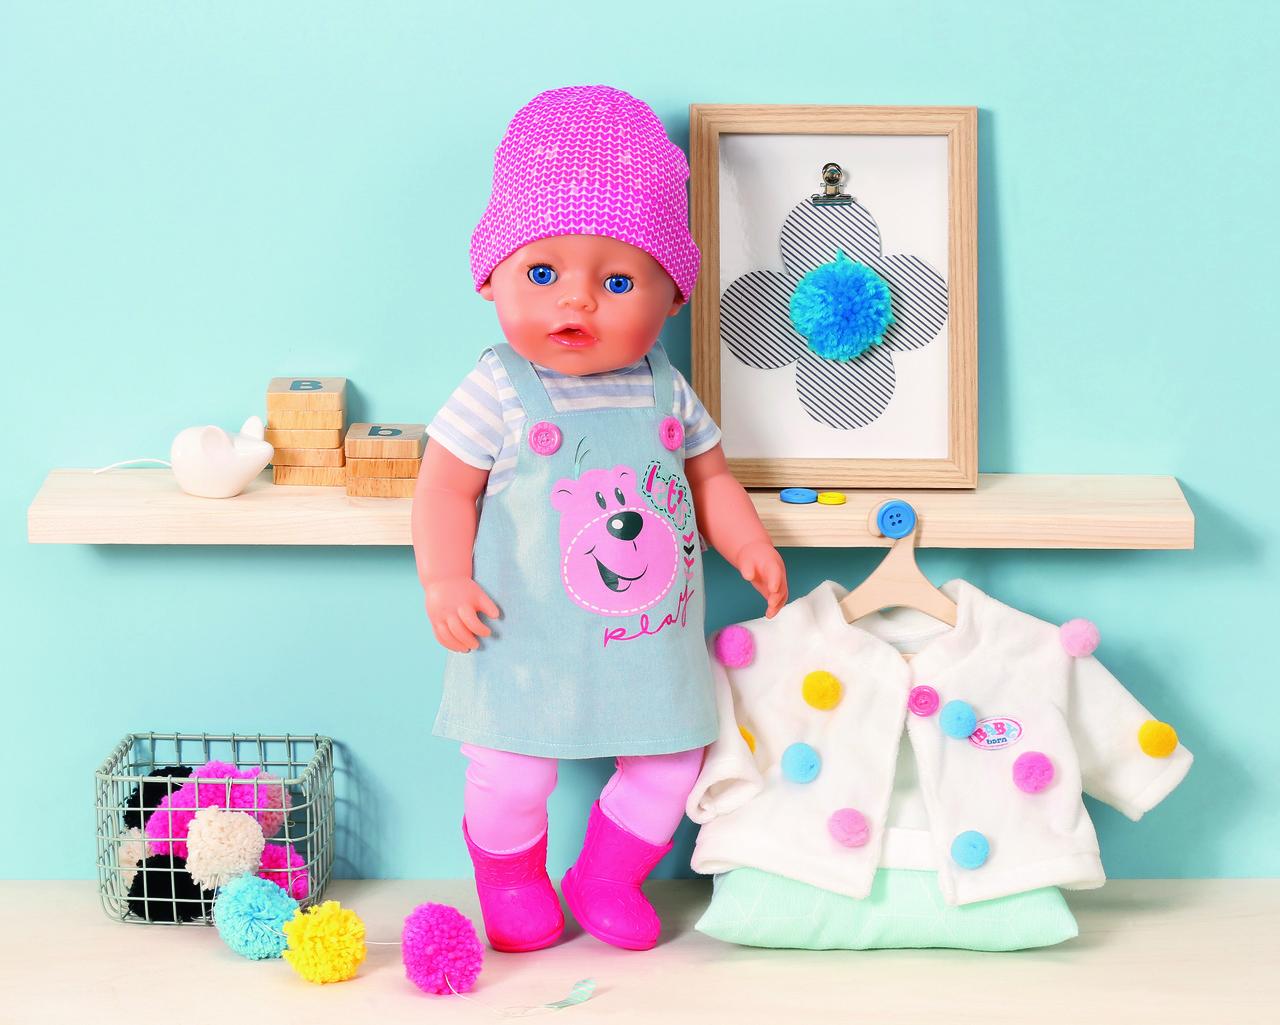 Кукла Беби Борн Кукла Нежные объятия Стильный Лук 826690 Zapf Creation